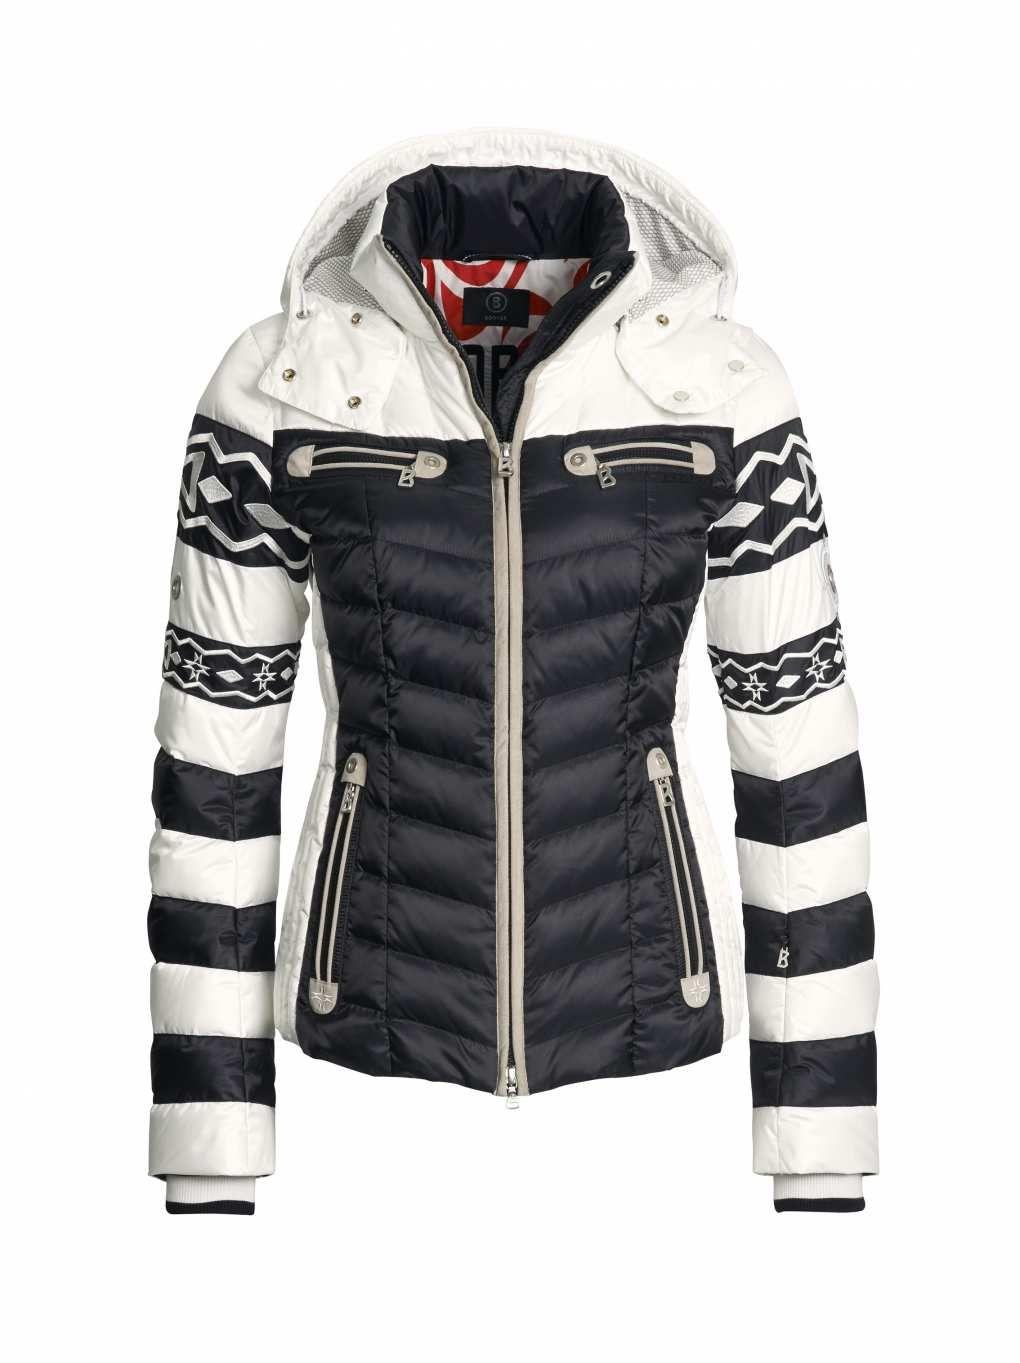 Buy womens ski jacket